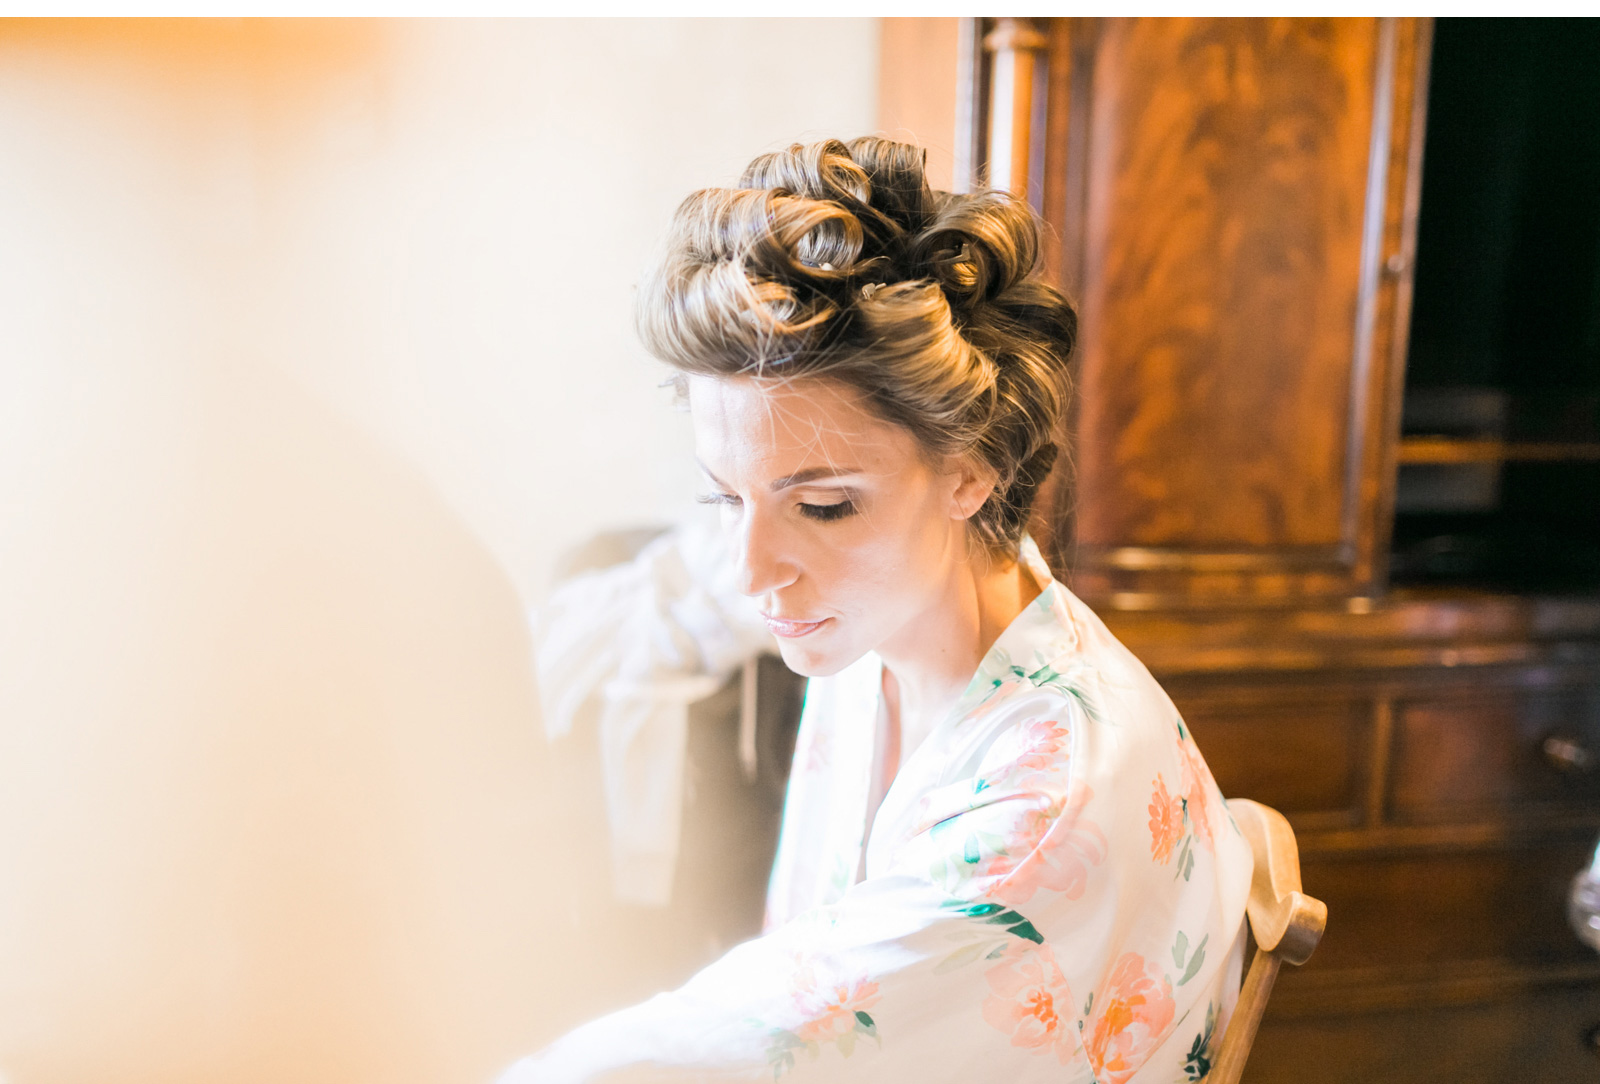 Mendocino-wedding-photographer-natalie-schutt-photography_01.jpg